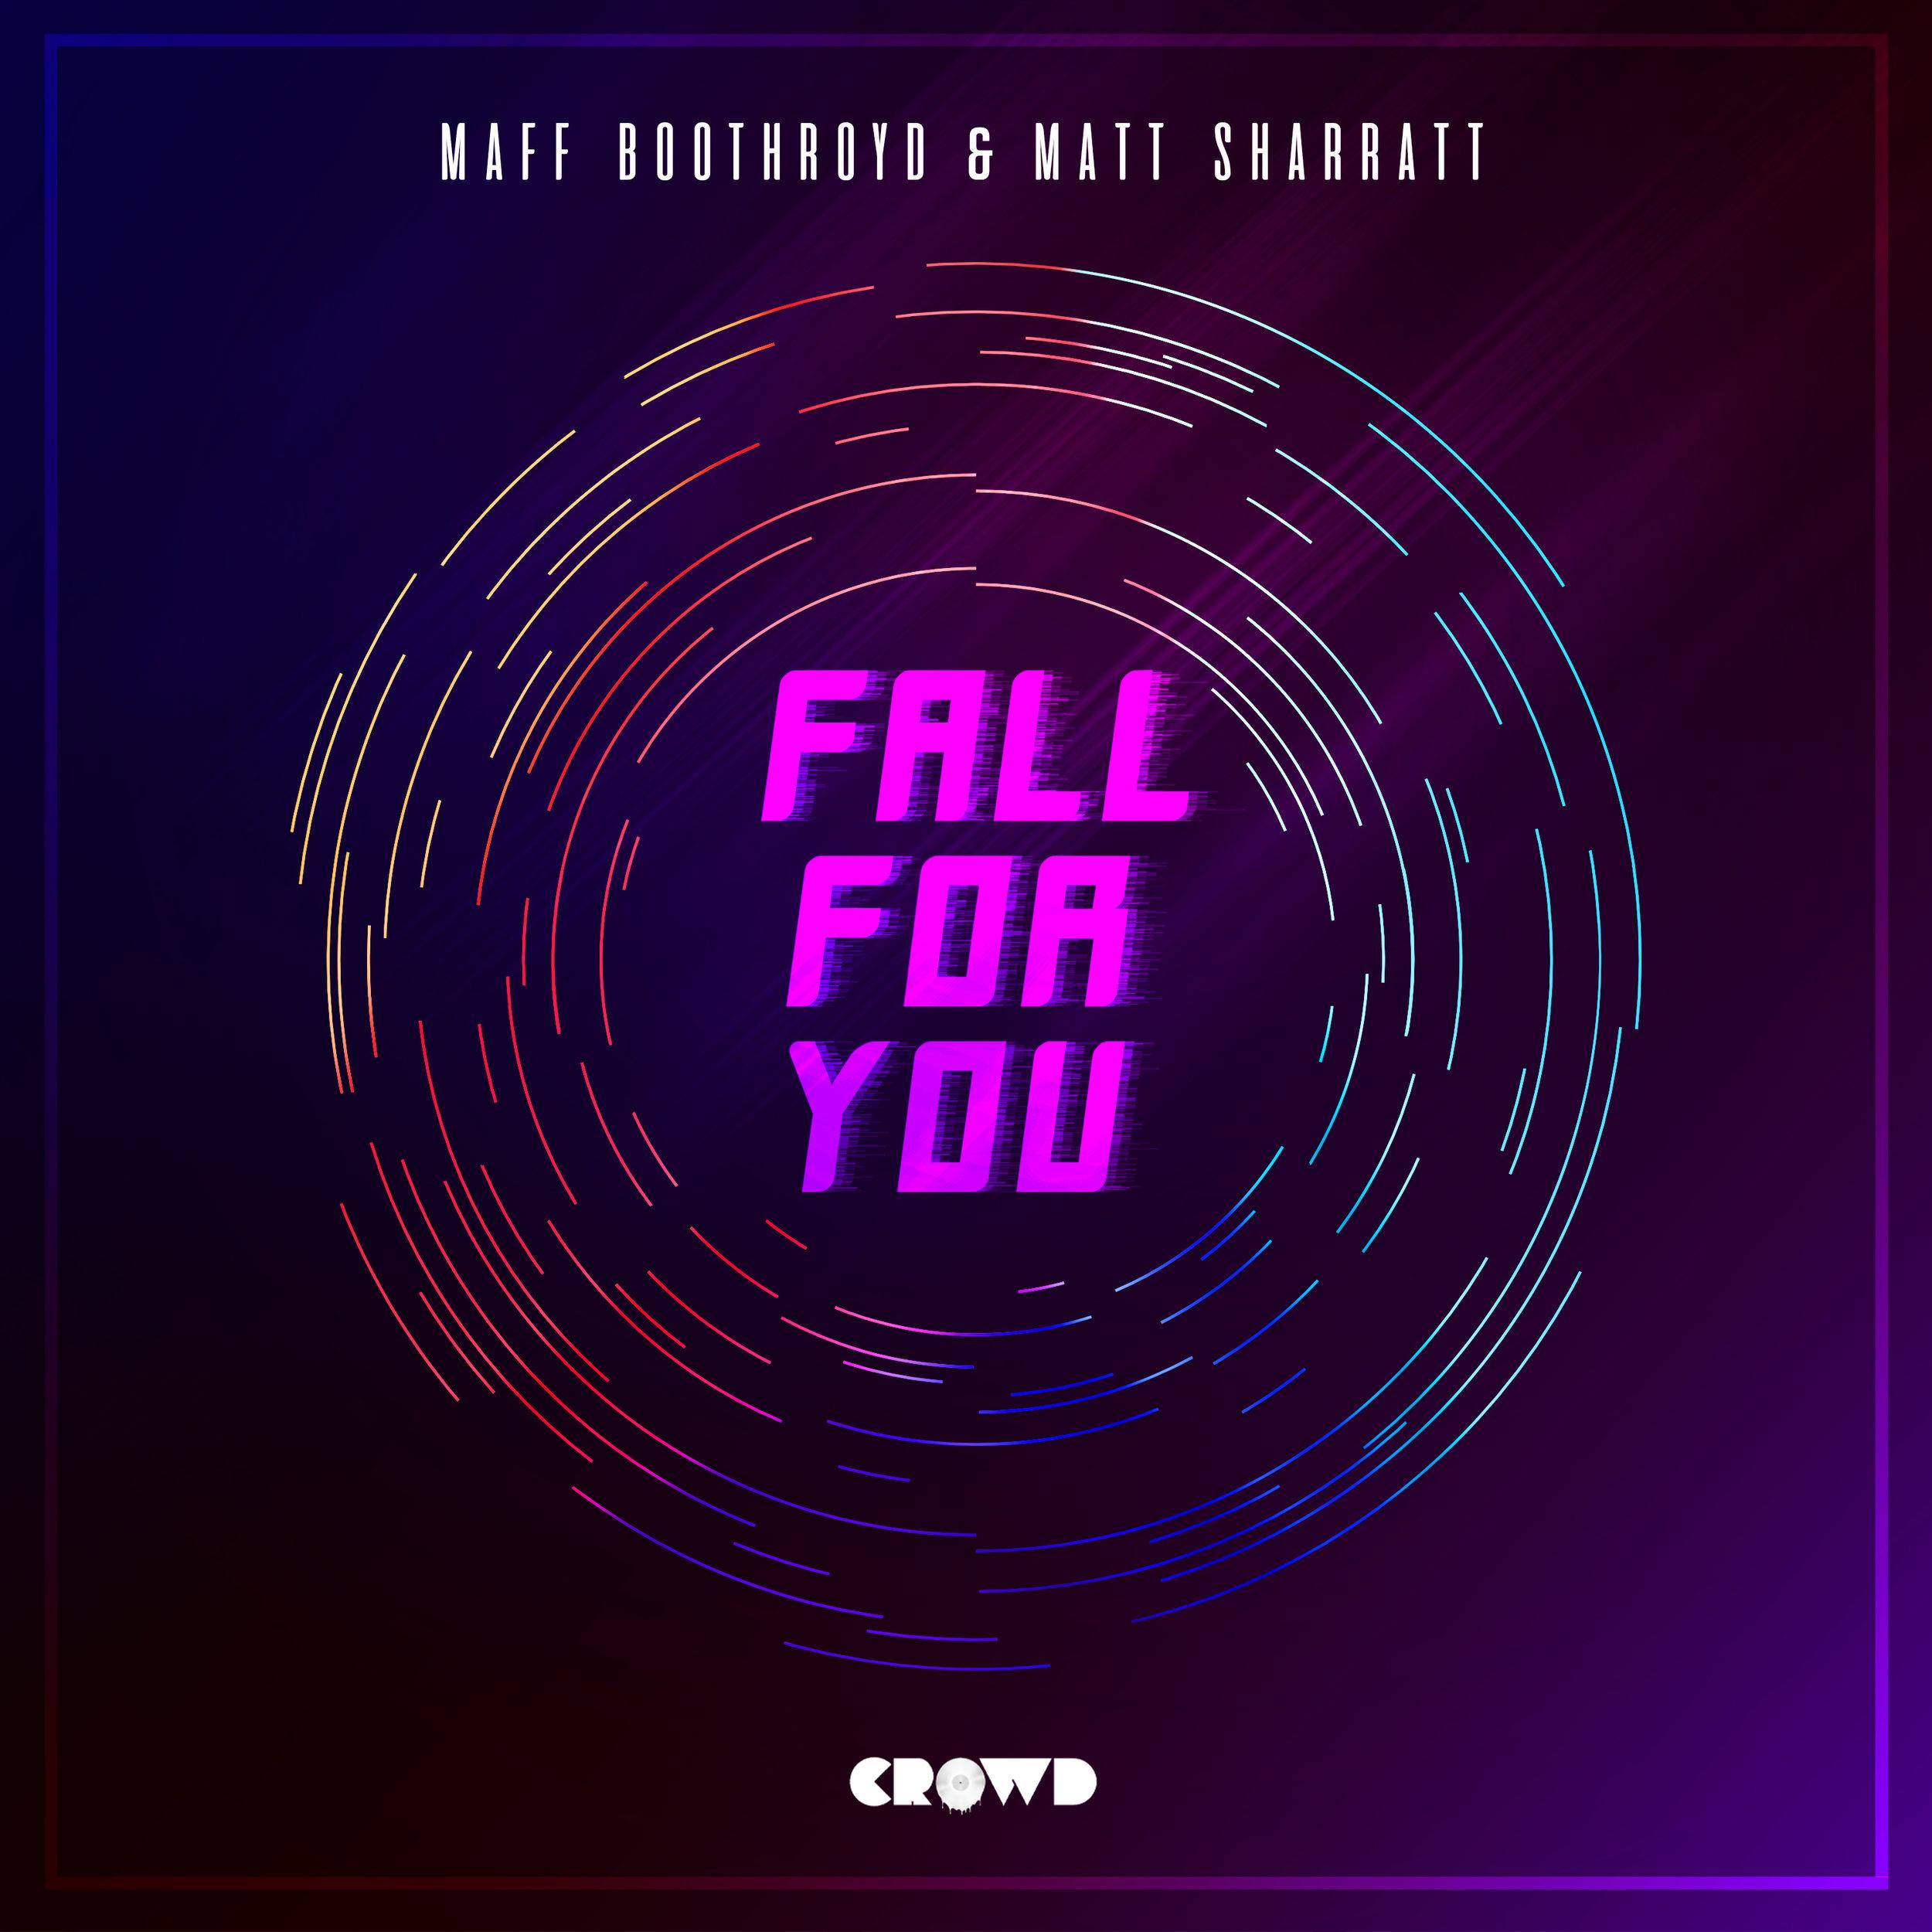 Maff Boothroyd & Matt Sharratt - Fall For You.jpg